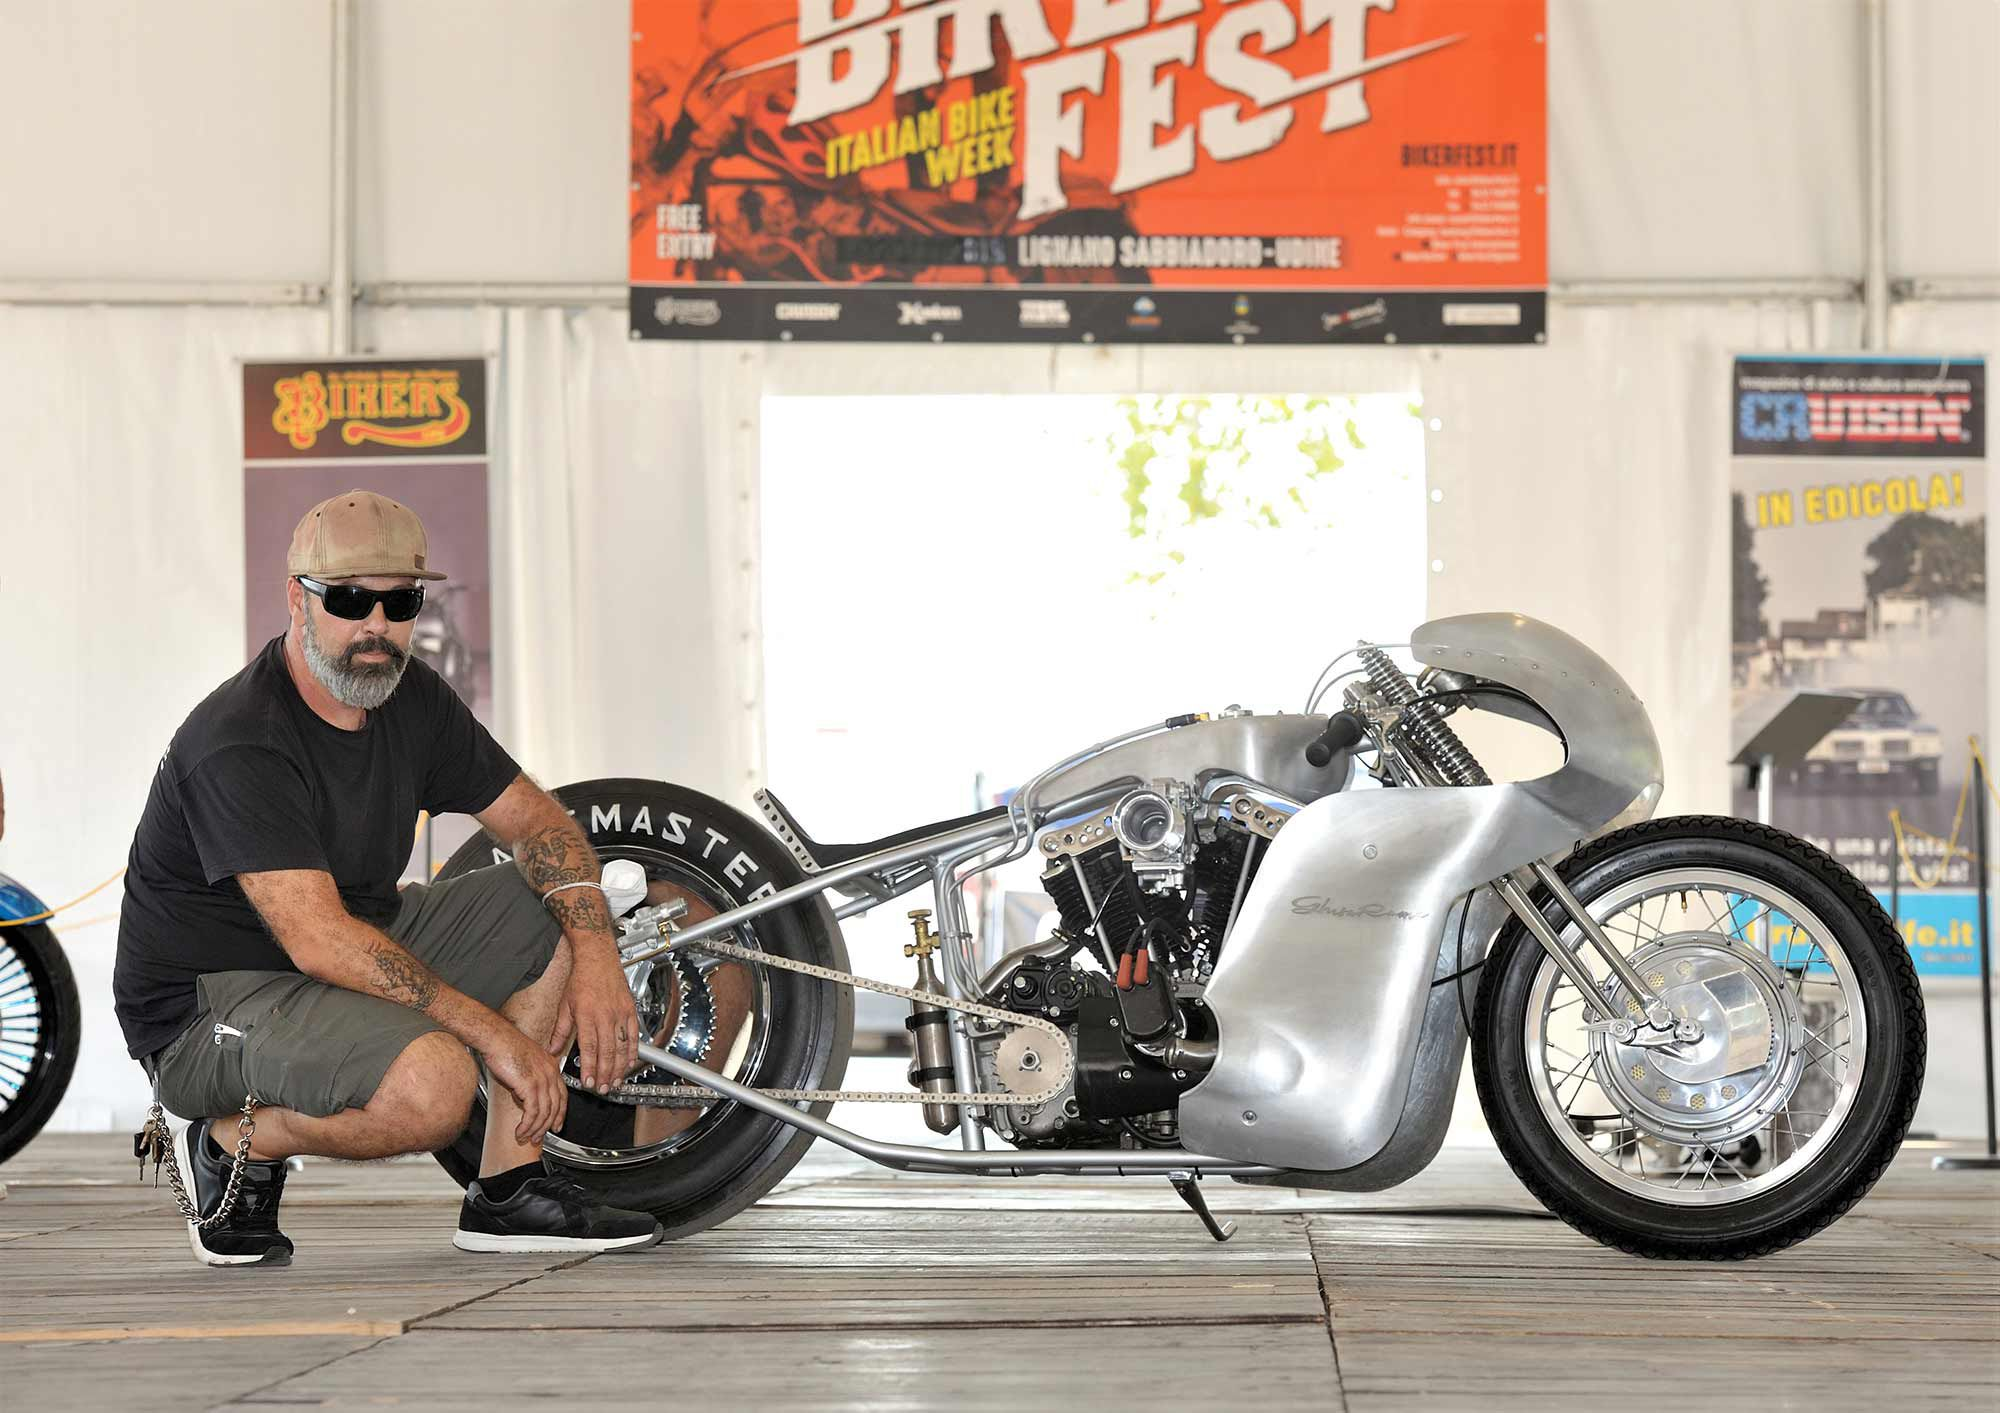 Taking Best of Show at the 2020 IMC Custom Bike Show Championship at Biker Fest was this Harley-Davidson 'Ghisarama' from Hazard.